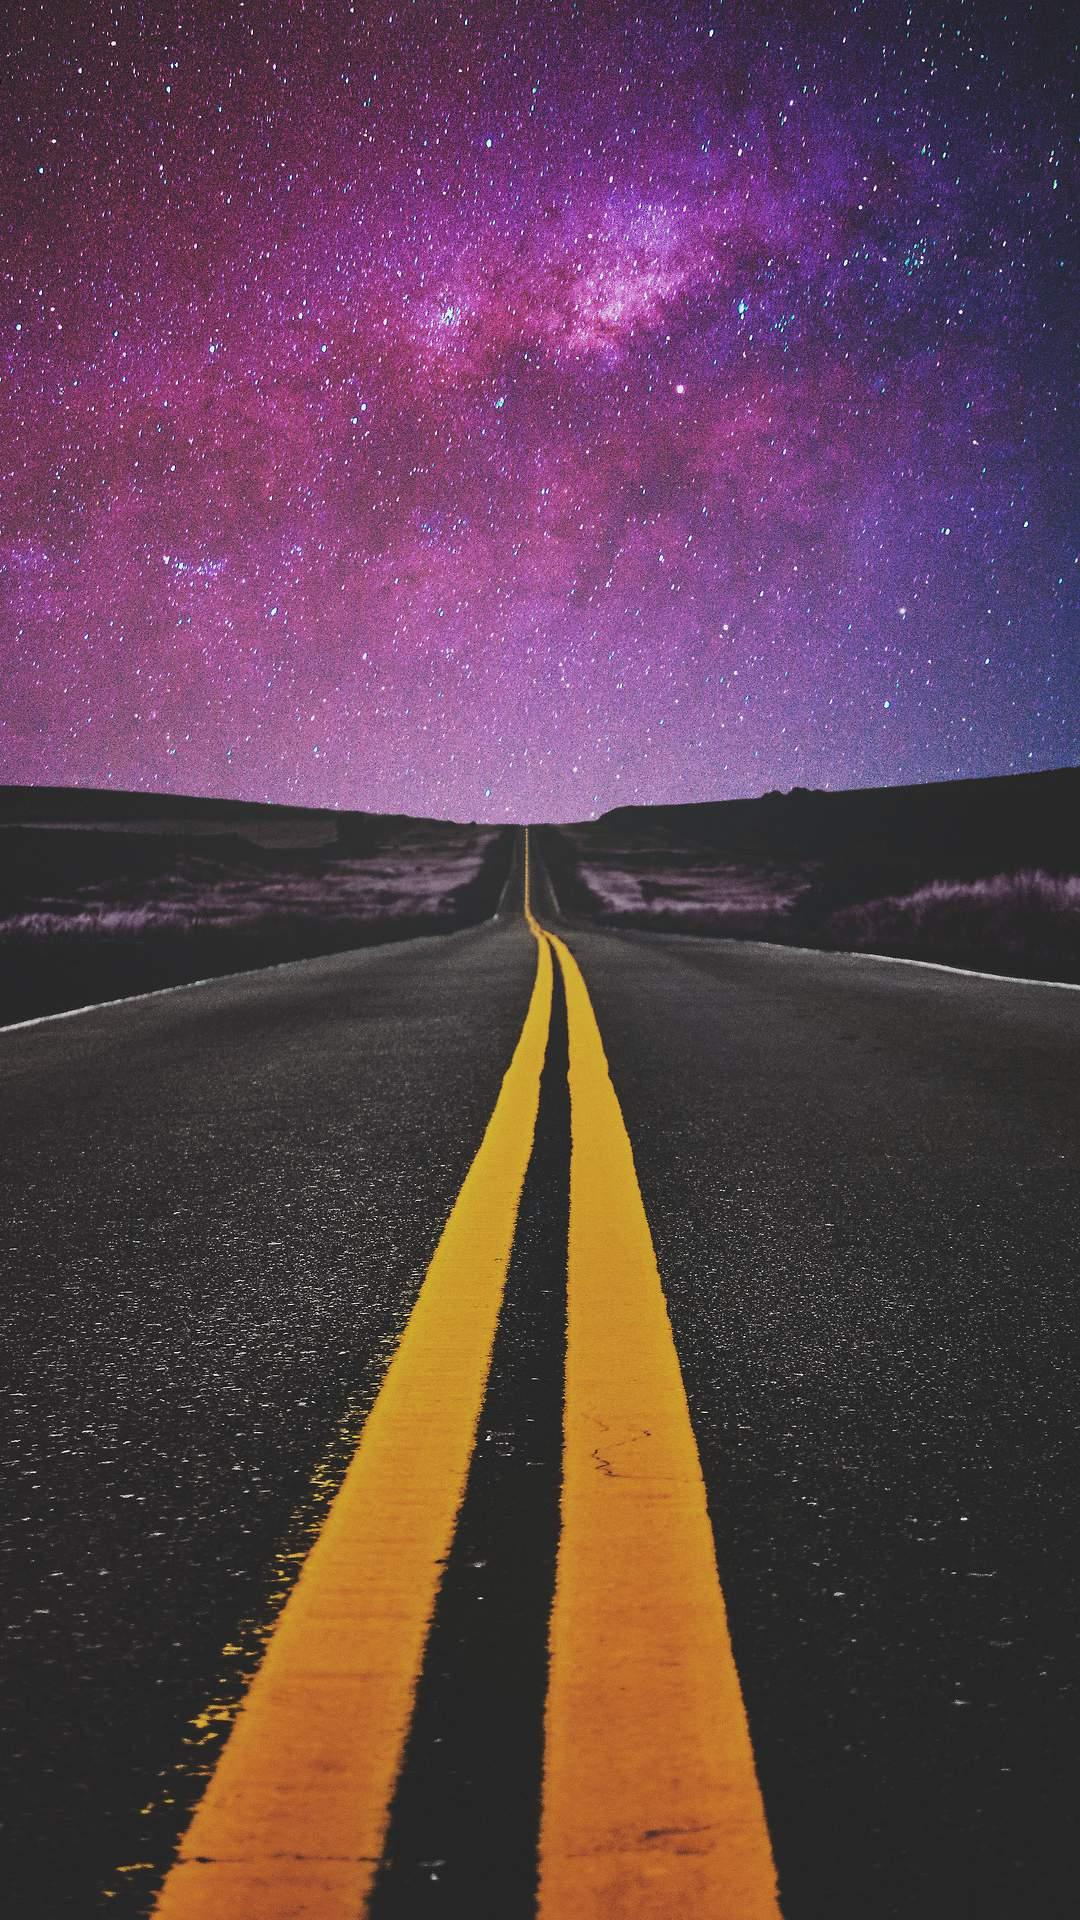 Night Road Starry Sky iPhone Wallpaper